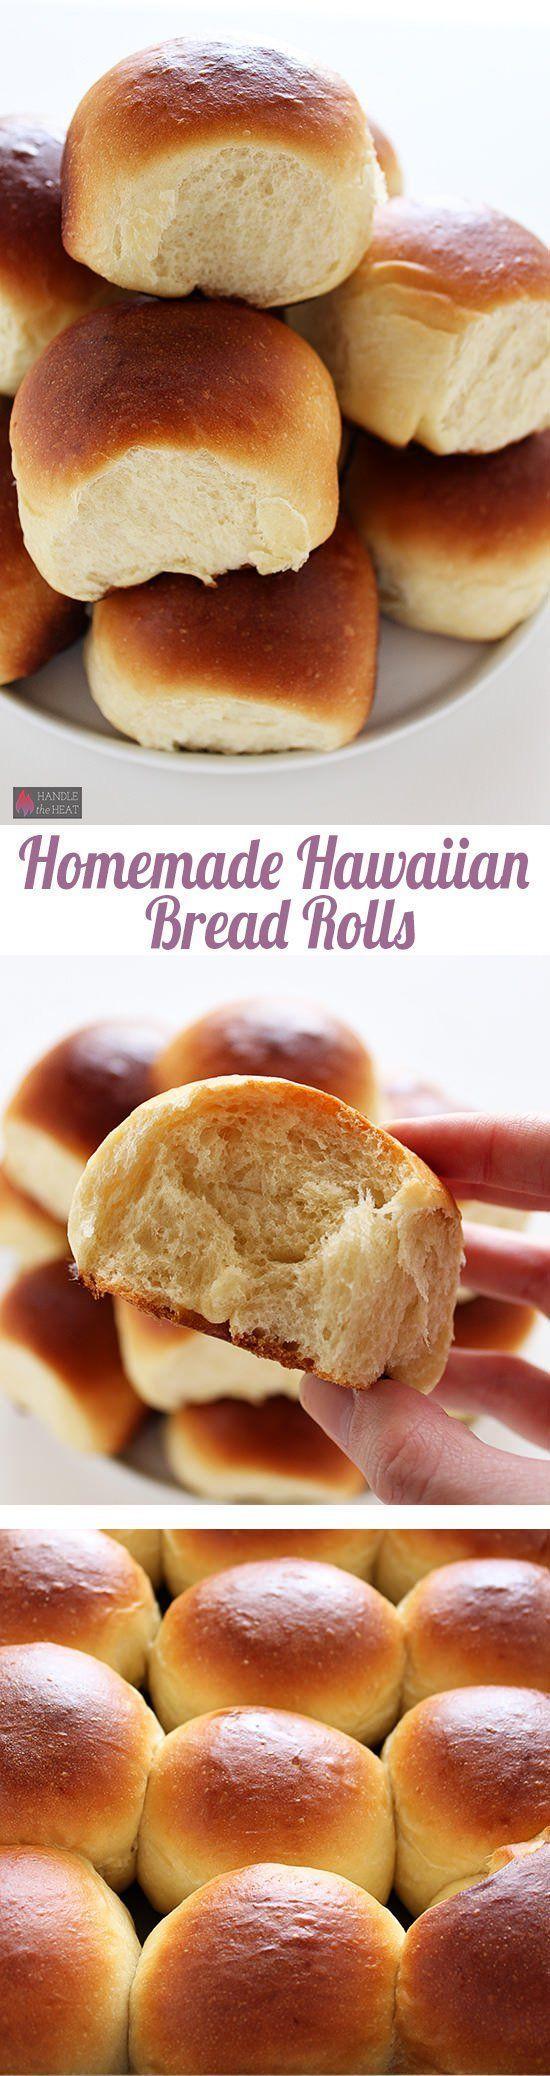 Homemade Hawaiian Bread Rolls - perfect copycat recipe!!